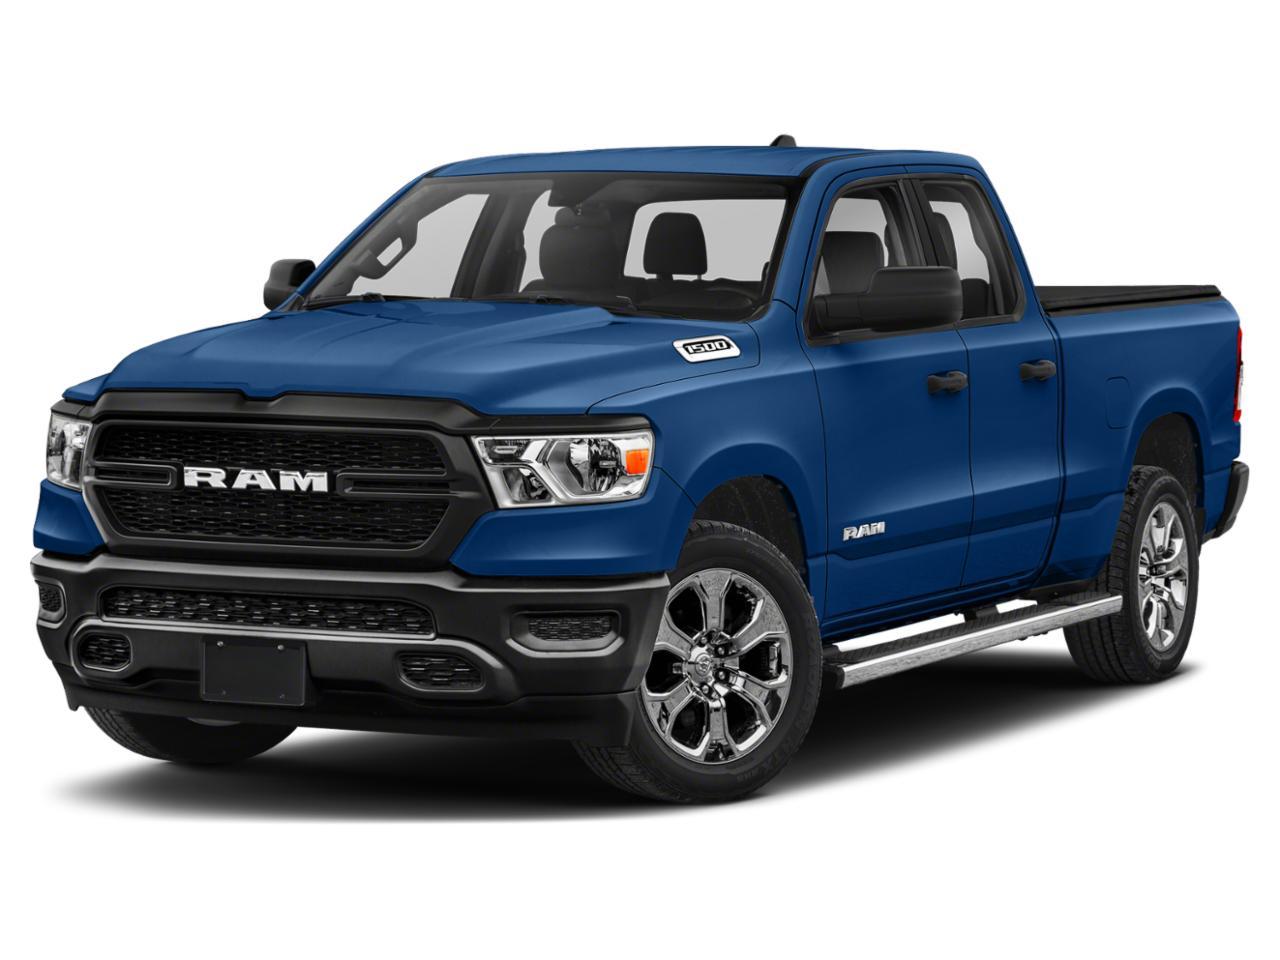 2019 Ram 1500 Vehicle Photo in Peoria, IL 61615